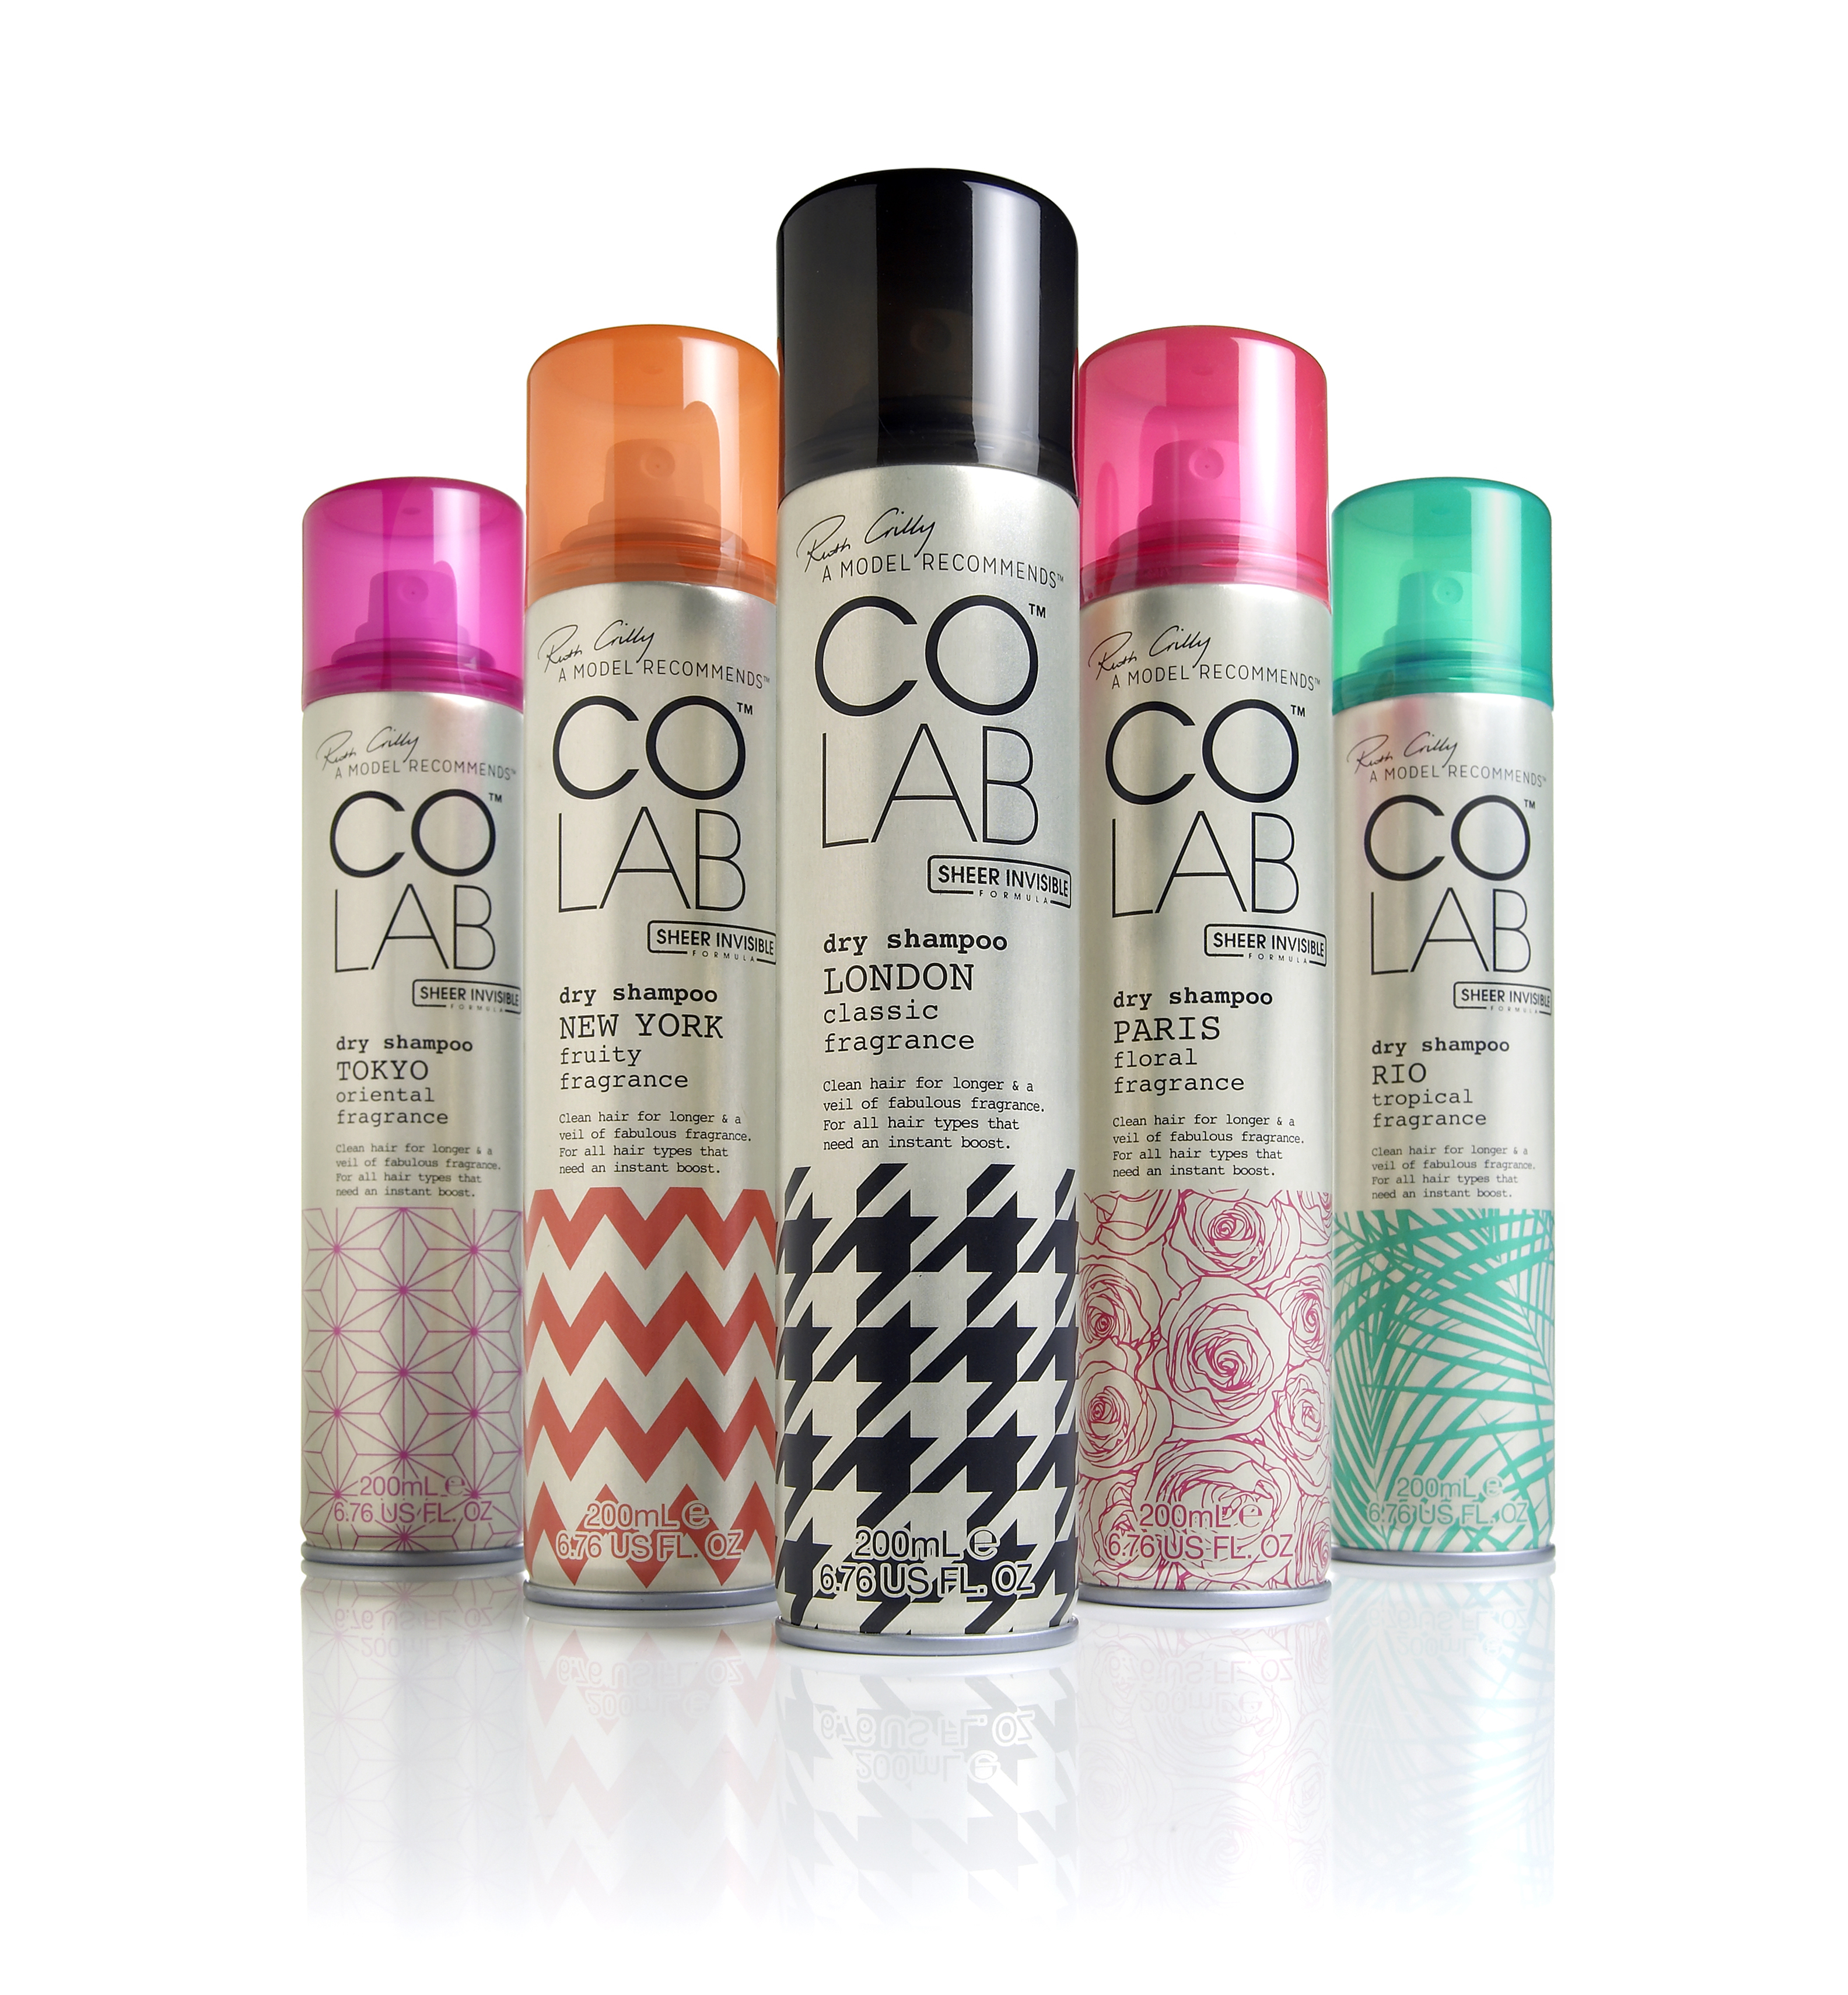 COLAB-Dry-Shampoo-